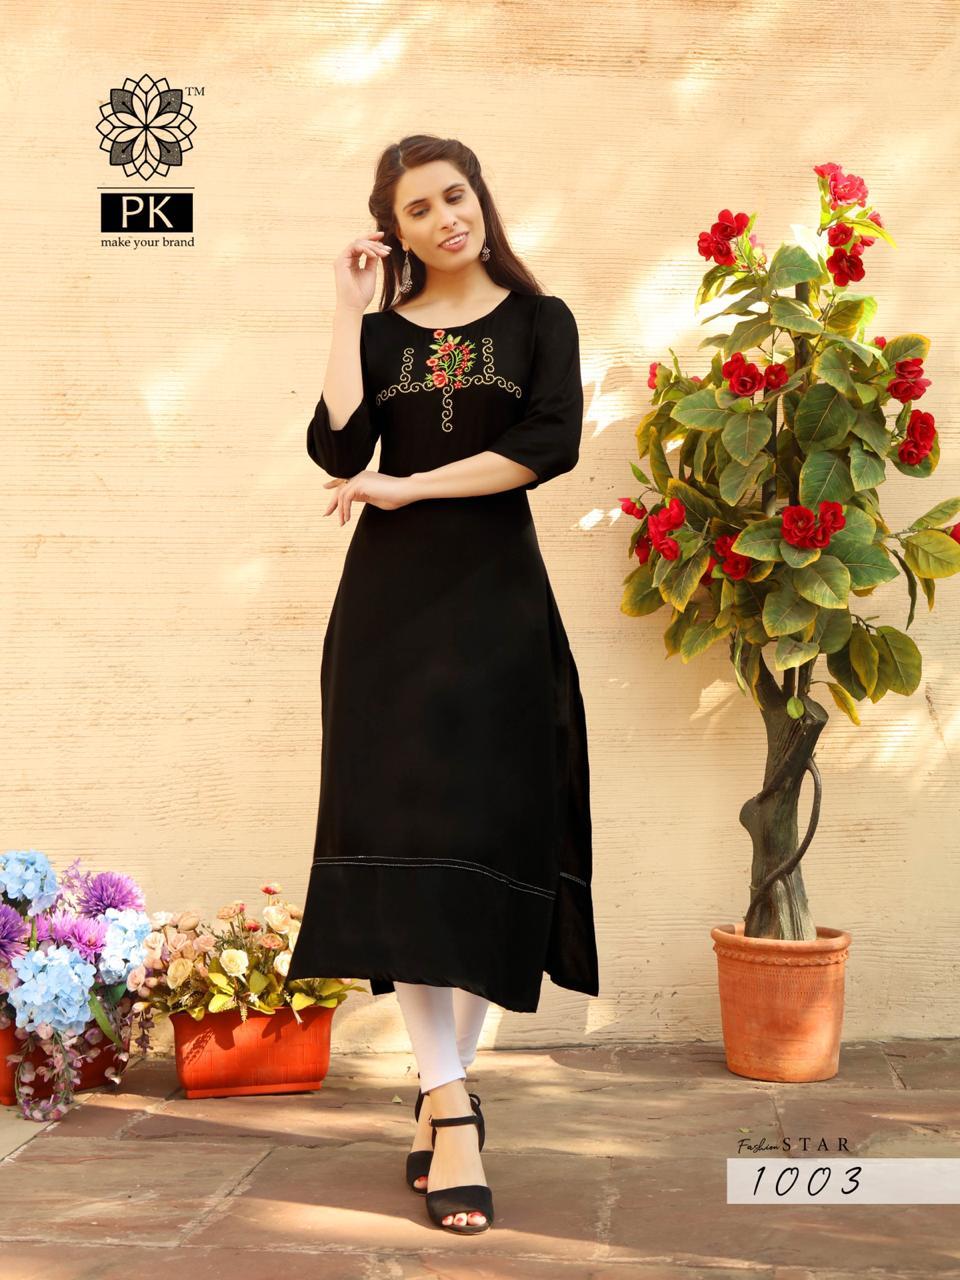 Pk Fashion Star Vol 1 Kurti Wholesale Catalog 10 Pcs 8 - Pk Fashion Star Vol 1 Kurti Wholesale Catalog 10 Pcs